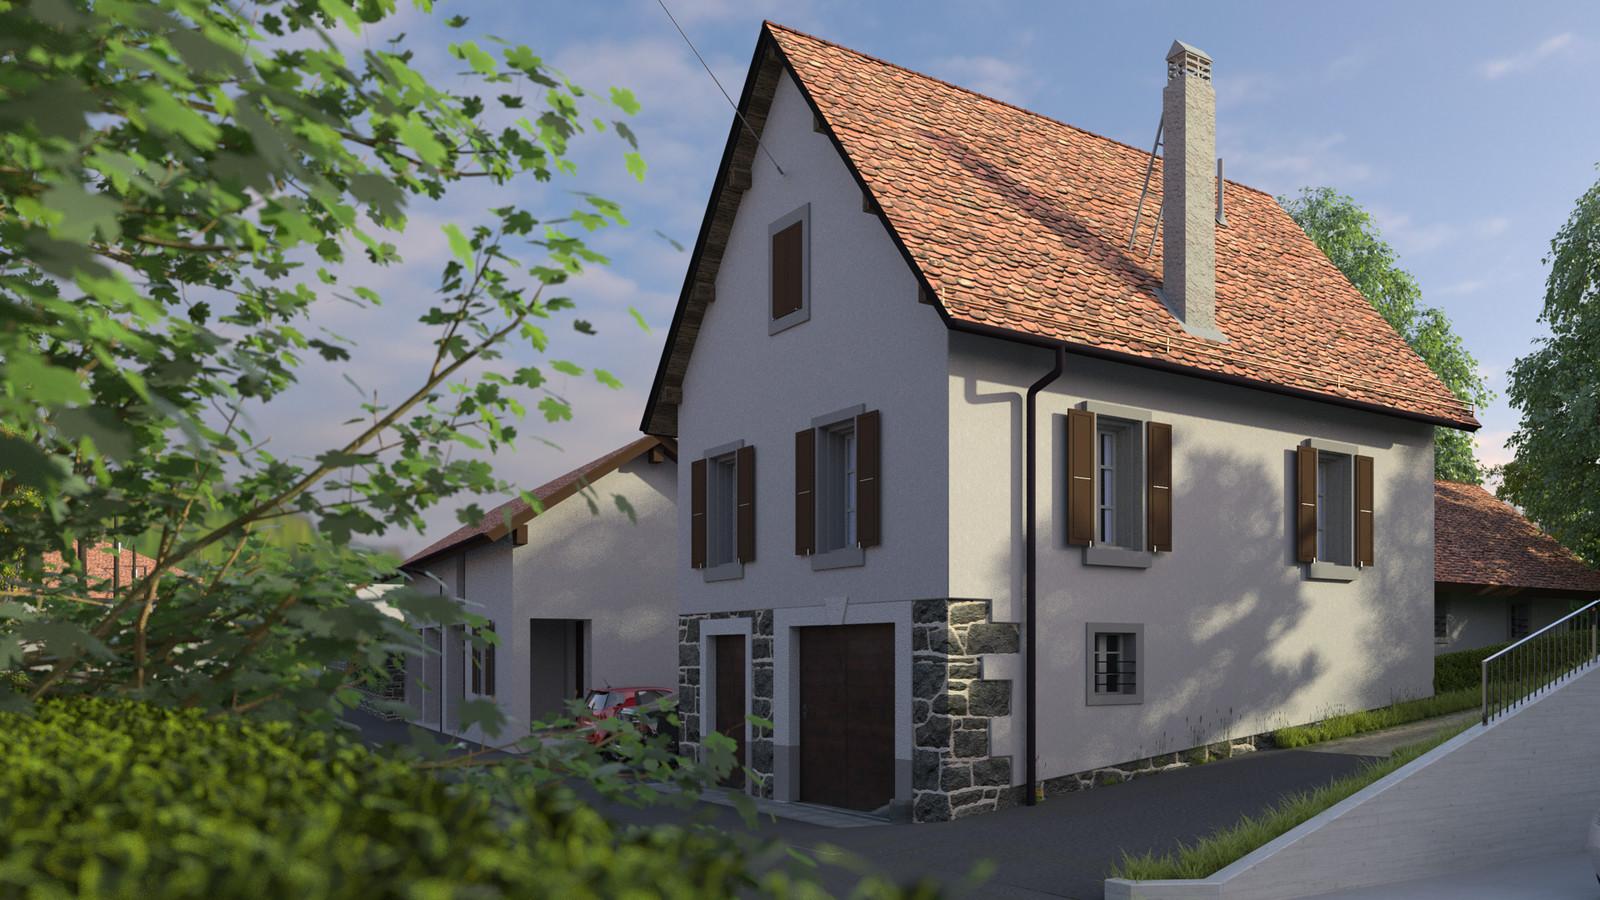 SketchUp + Thea Render  Little Swiss House Scene 28 0917 Dawn 03 HD 1920 x 1080 Presto MC